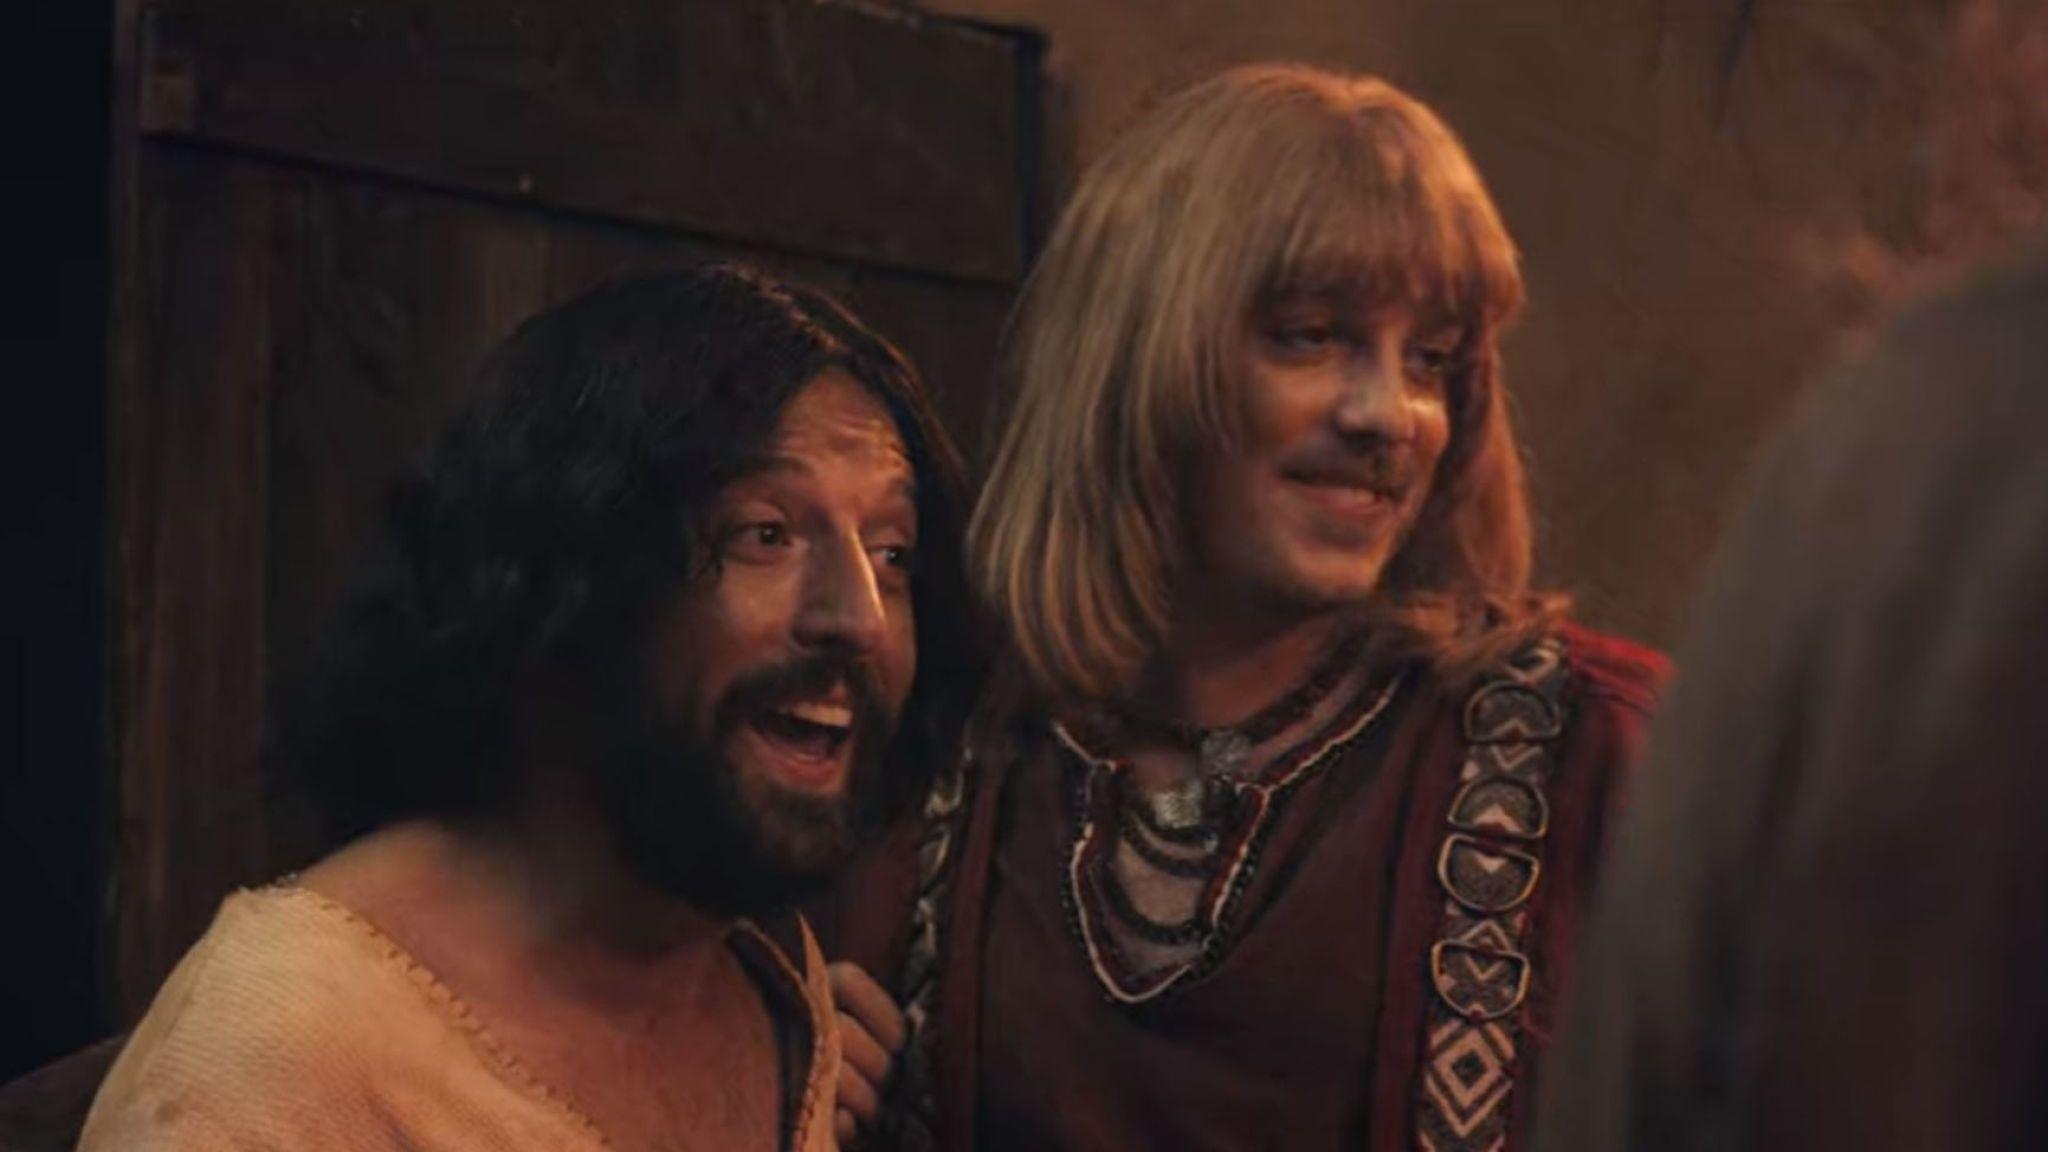 Jesus (left) and his friend, Orlando. Pic: Netflix